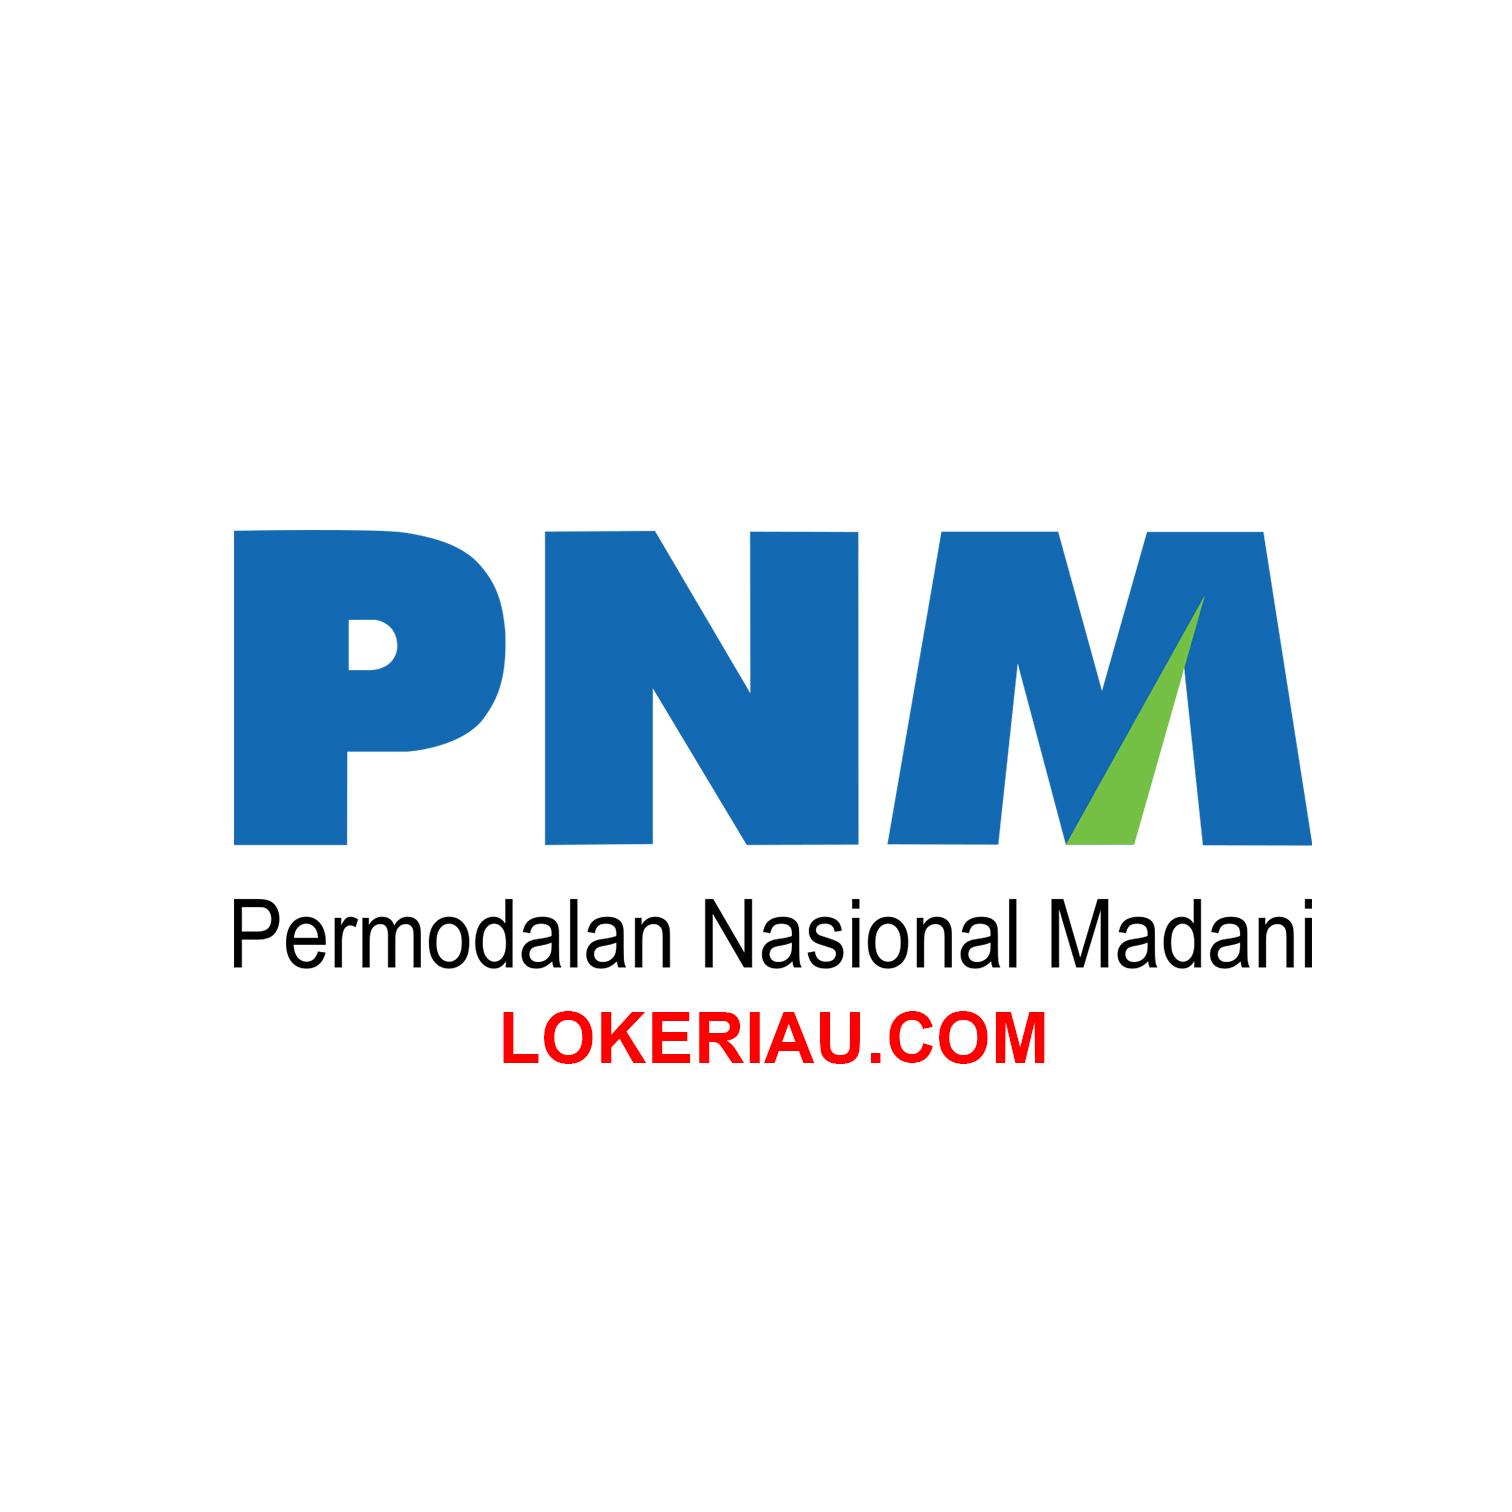 Lowongan Kerja PNM Pekanbaru